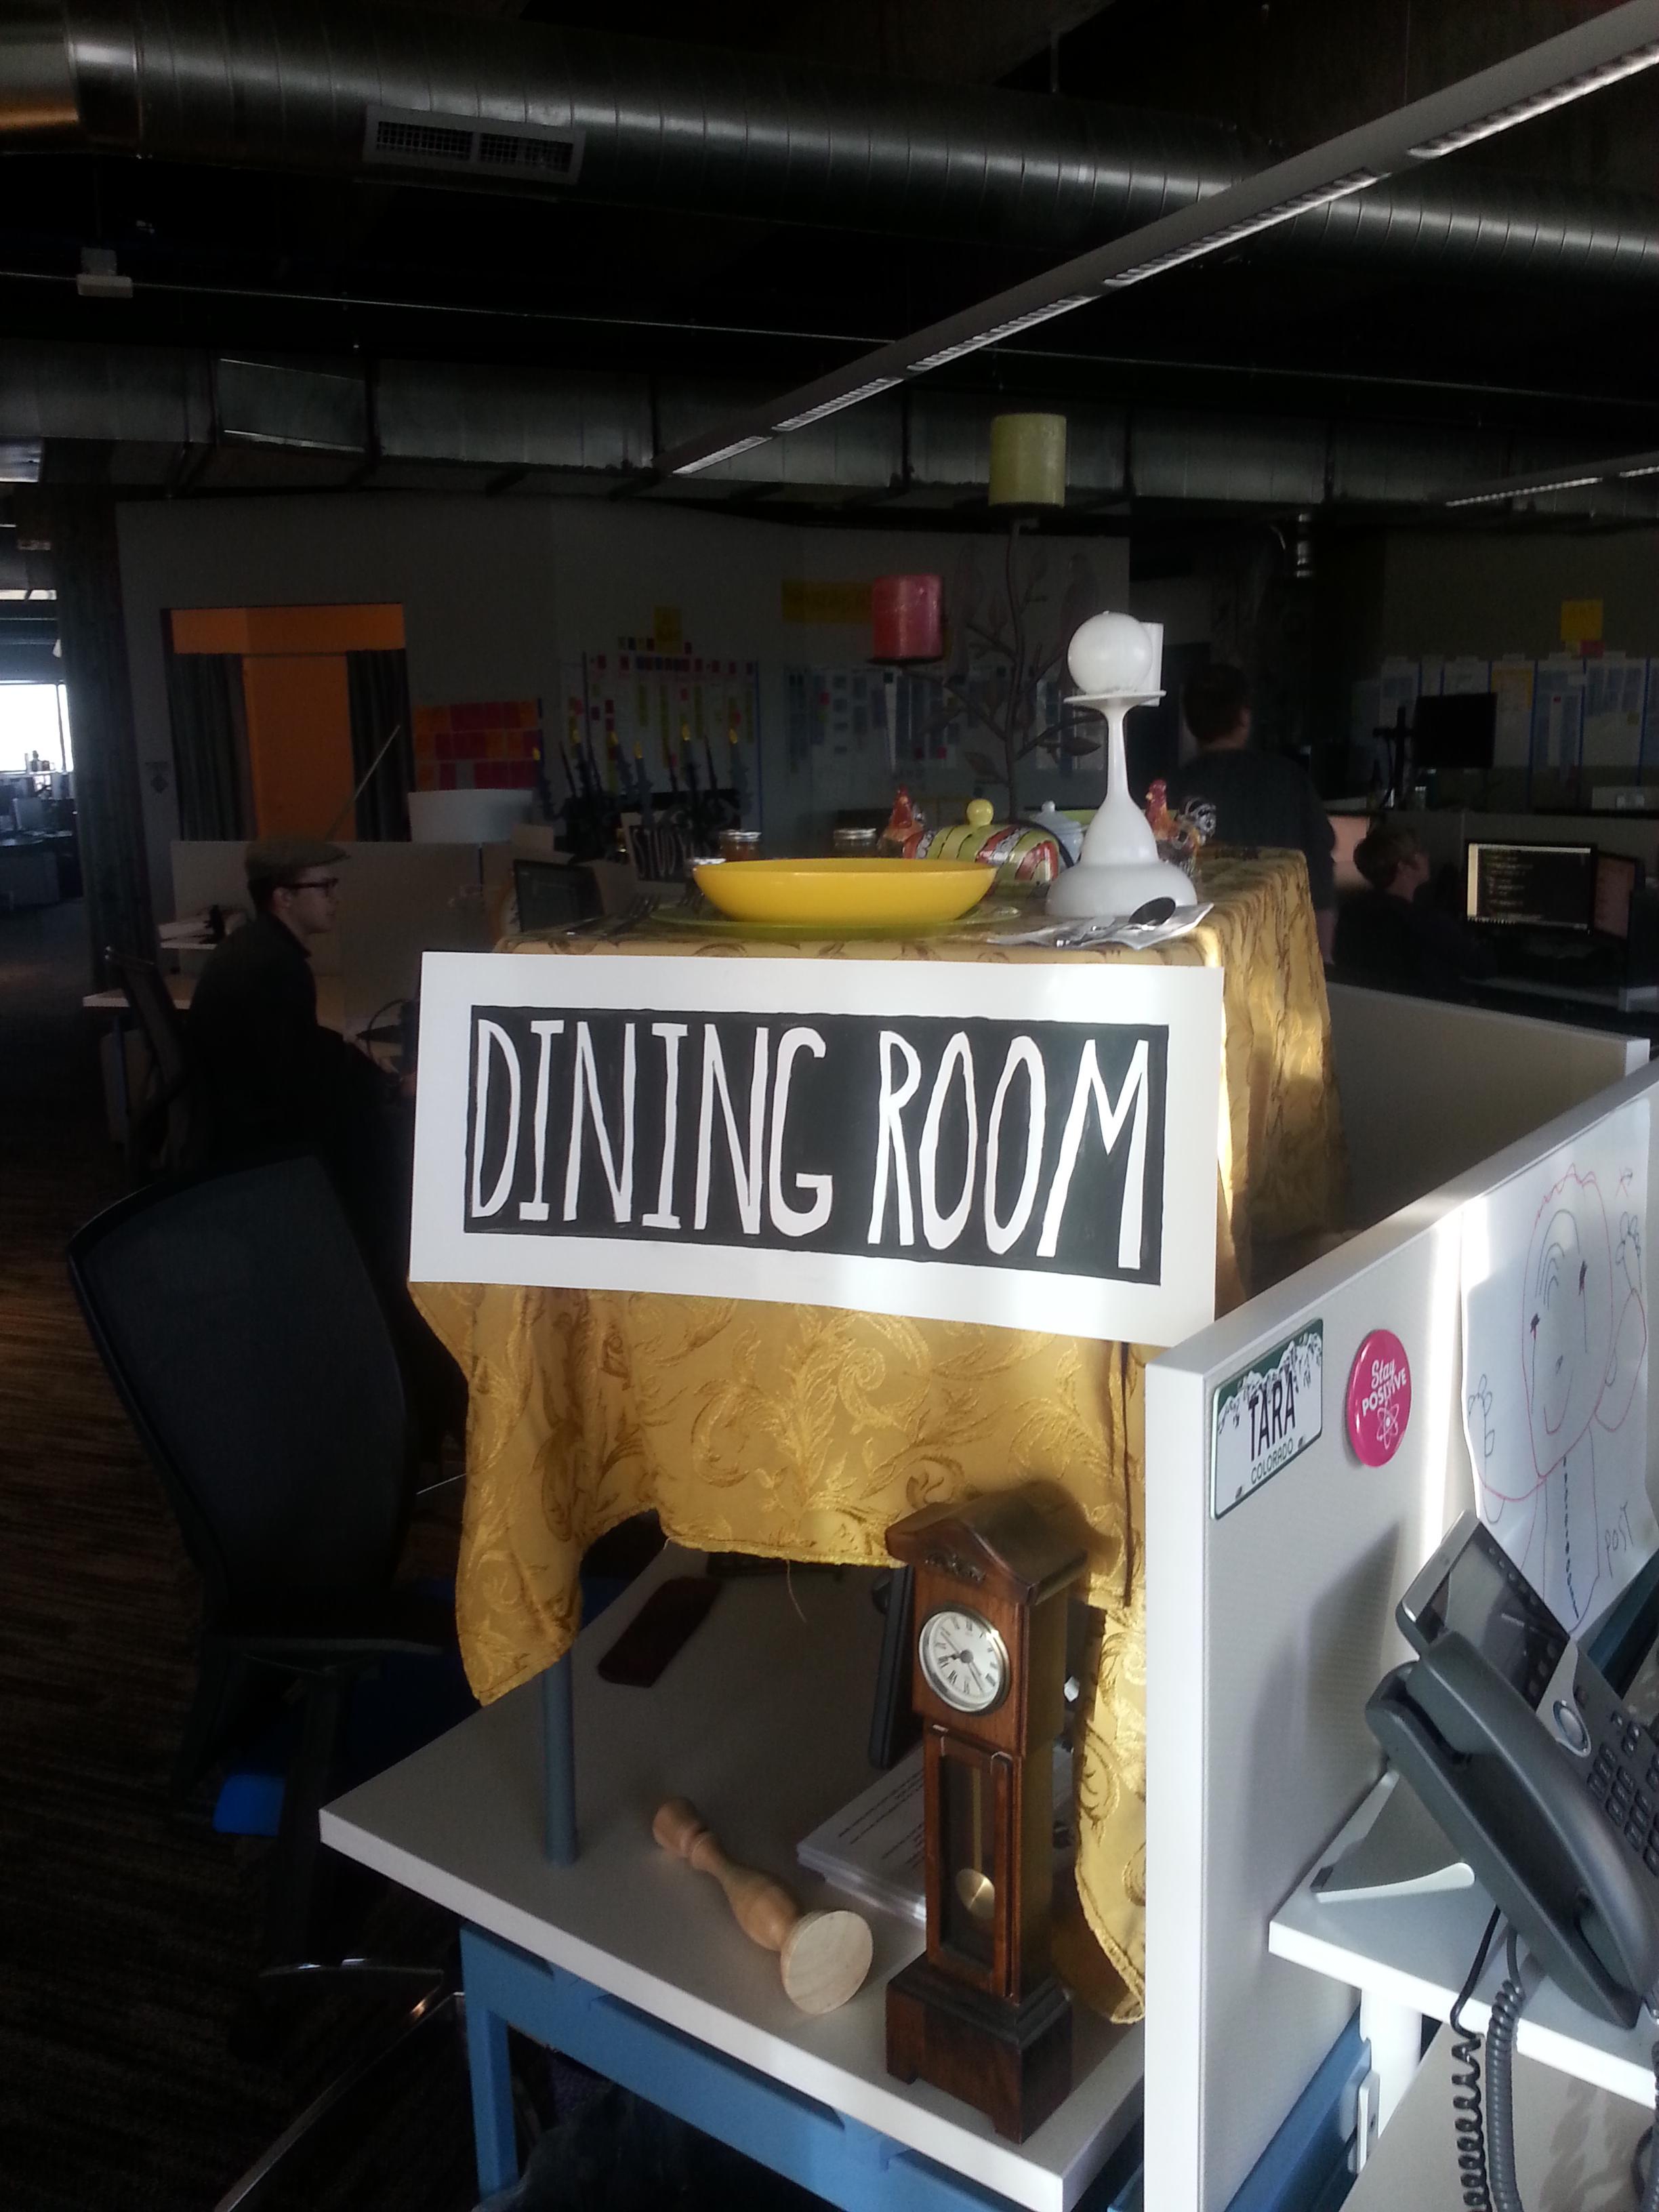 dining room.bmp